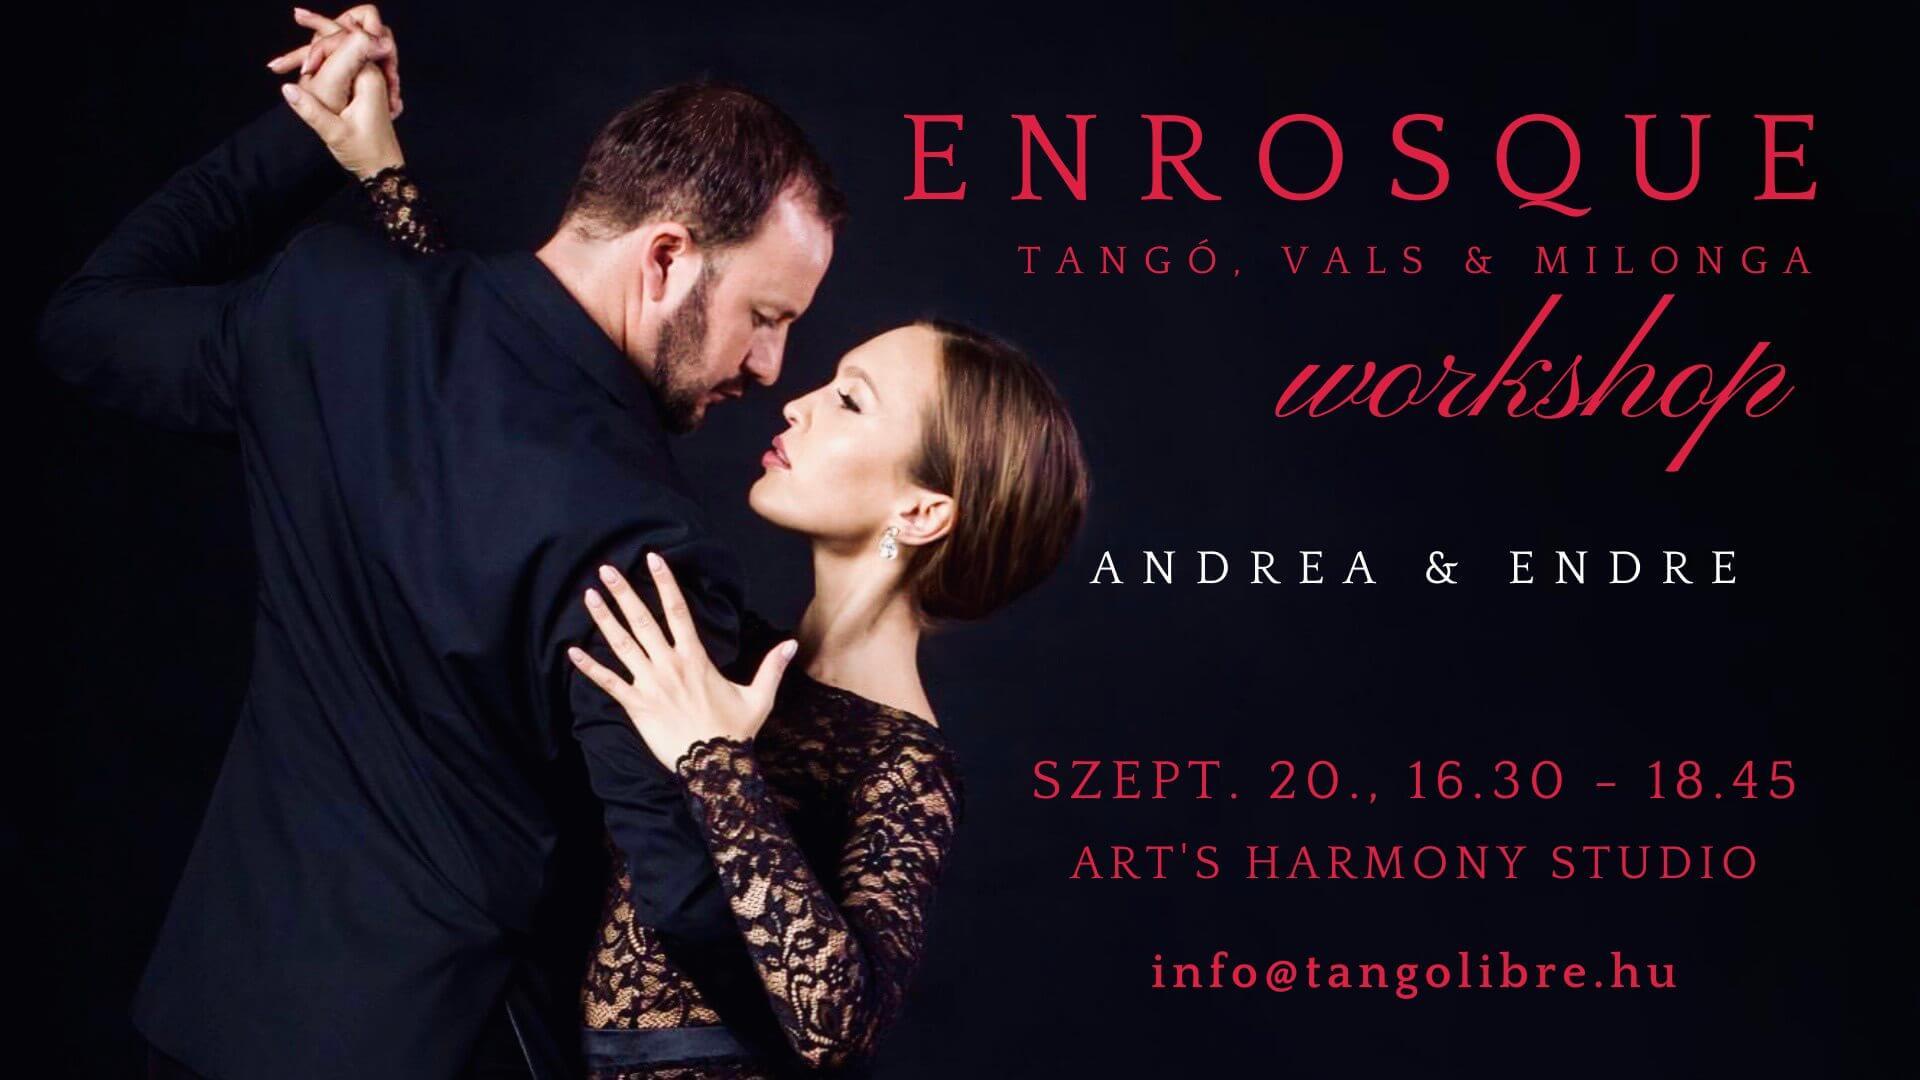 tango enrosque workshop